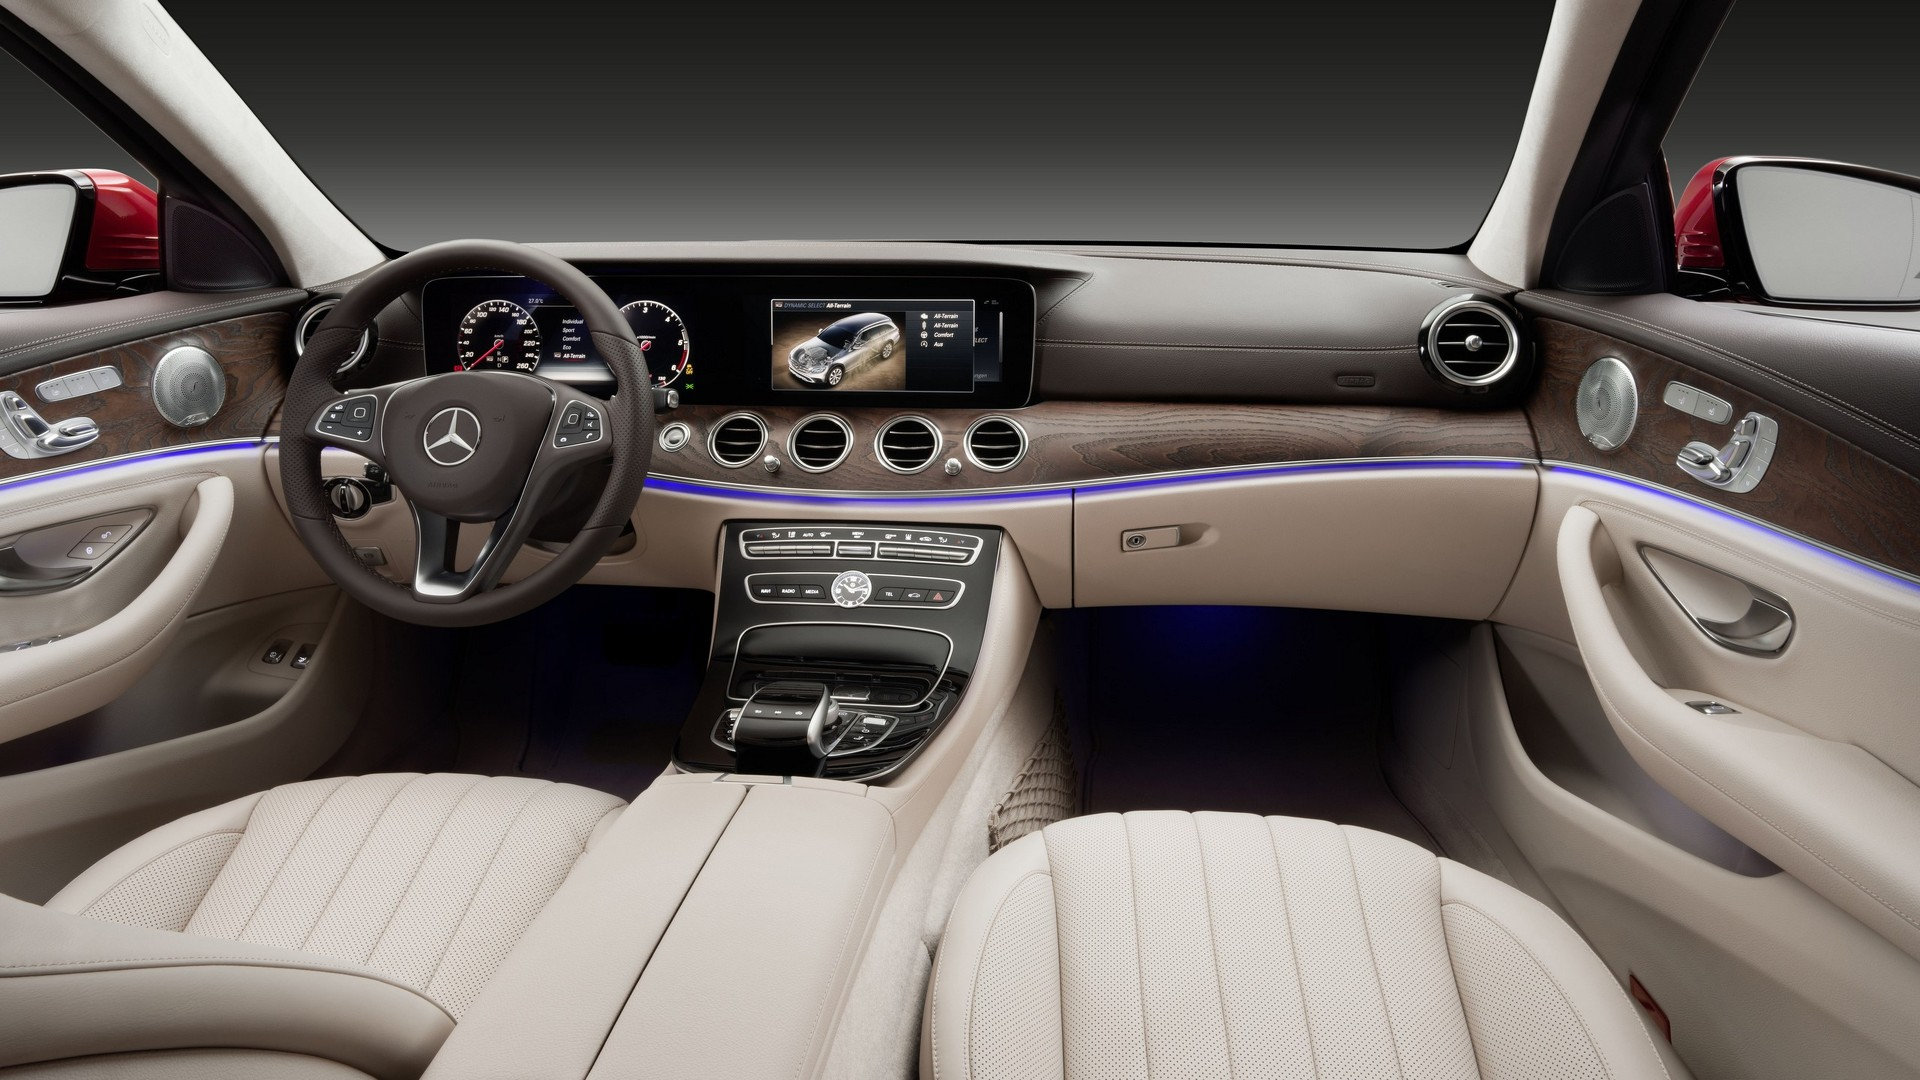 Mercedes G Wagon >> 2017 Mercedes-Benz E-Class All-Terrain revealed | PerformanceDrive